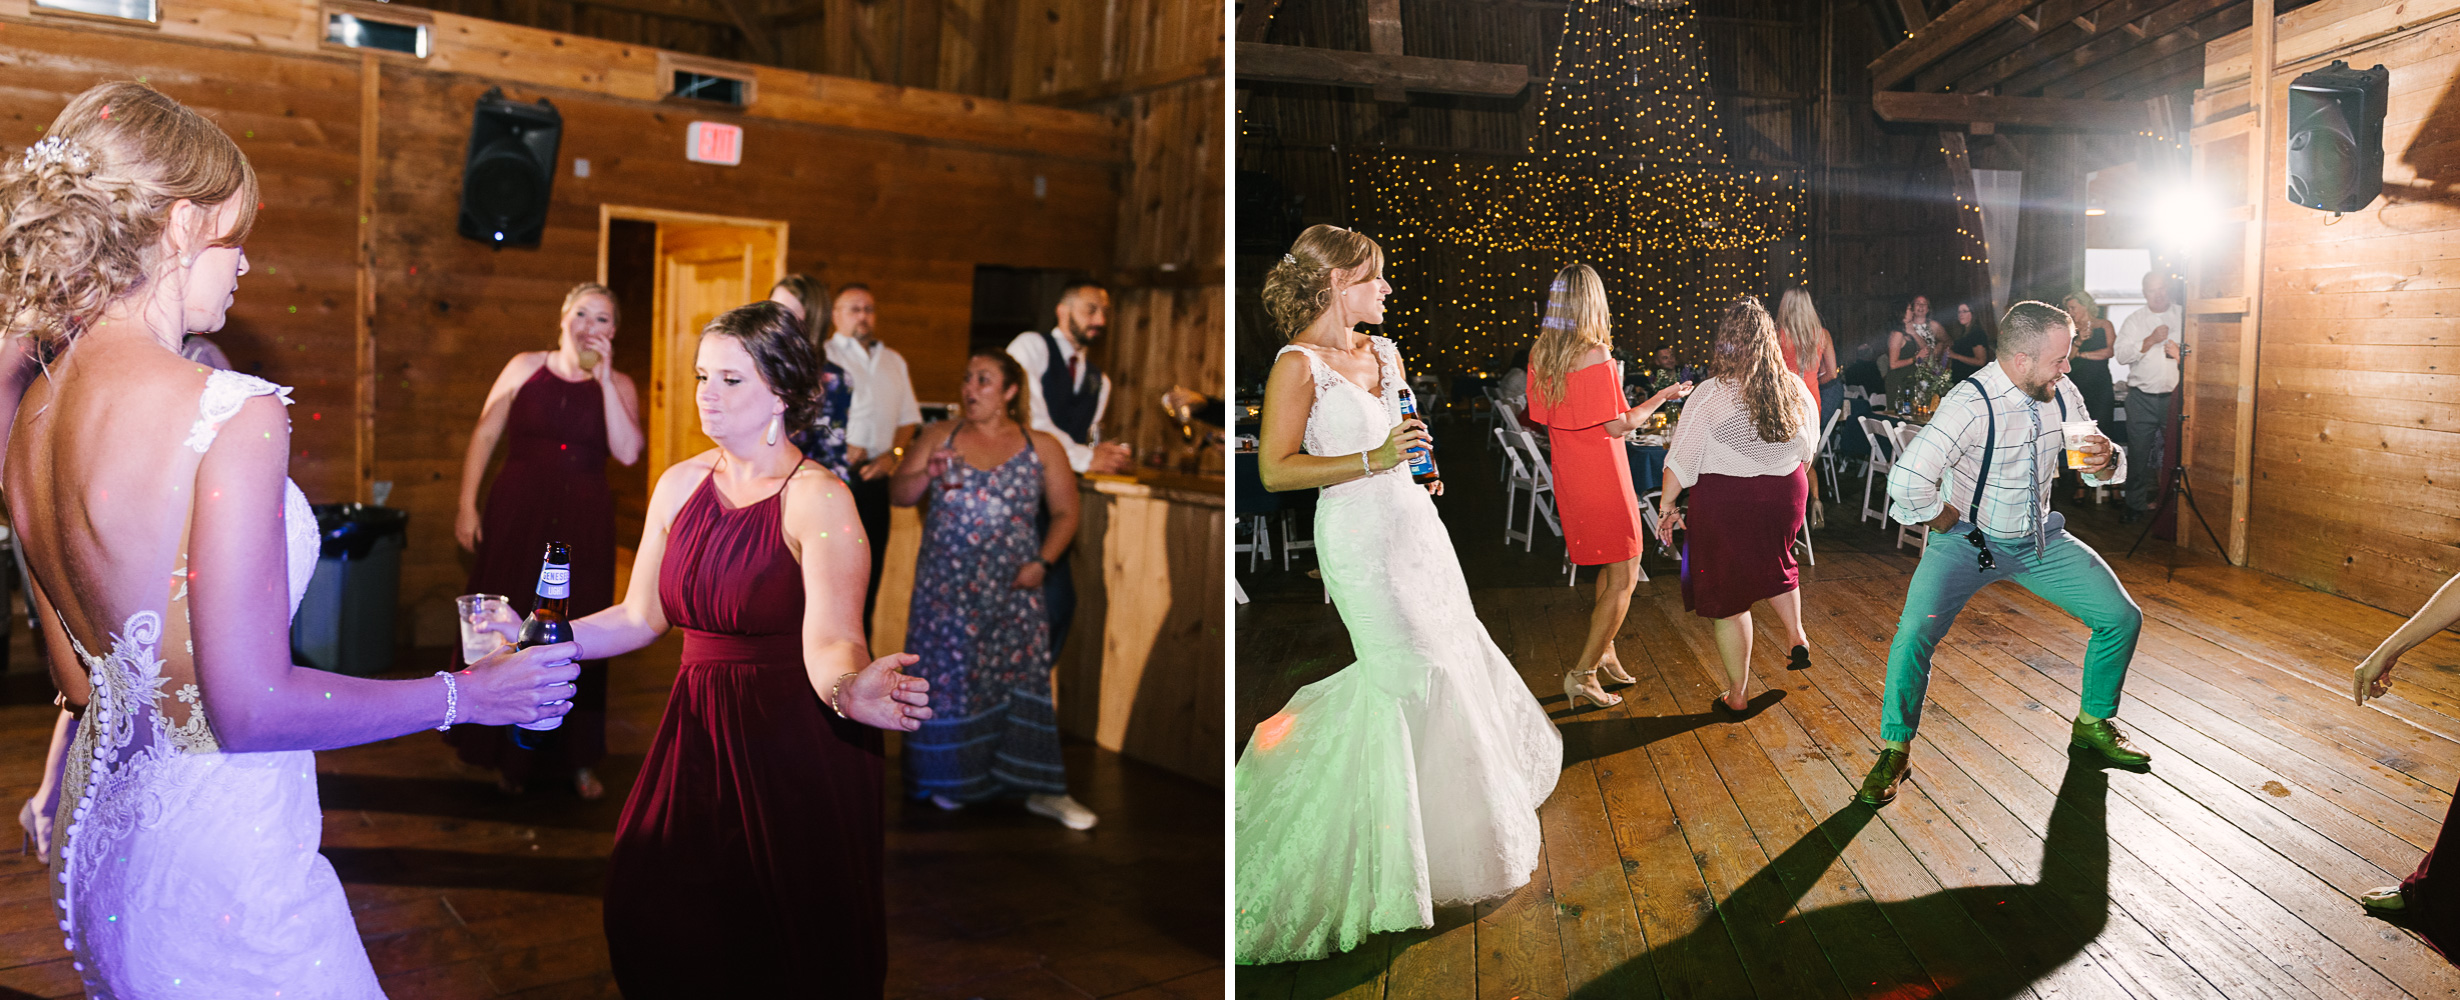 cobblestone-wedding-barn-rochester-photography-52.jpg